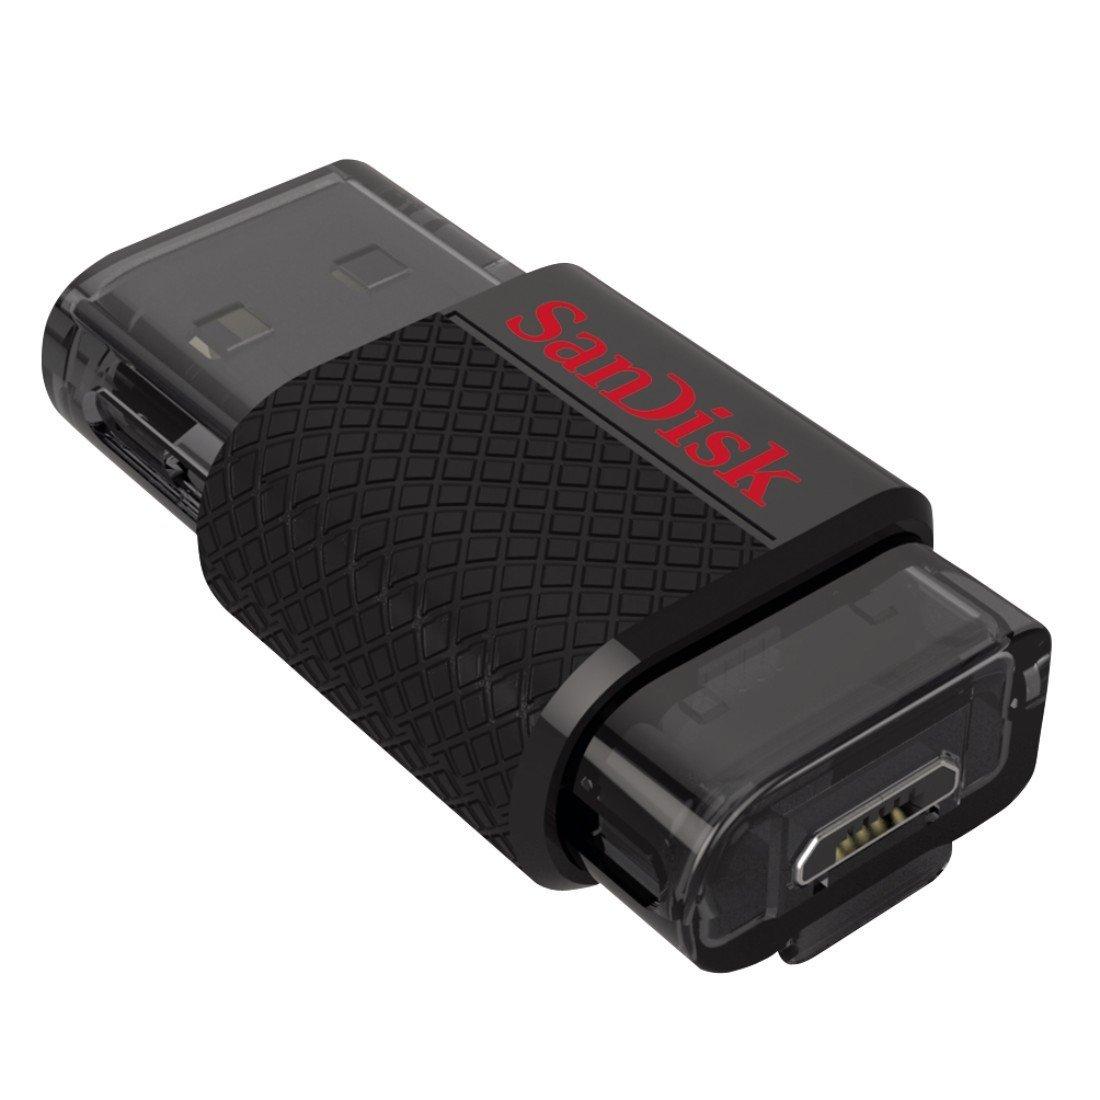 Sandisk M3 0 Ultra Dual Usb Drive Otg 16 Gb 3 Garansi Resmi 32gb M30 Flash Jual Welcome To 16gb Original Gam46